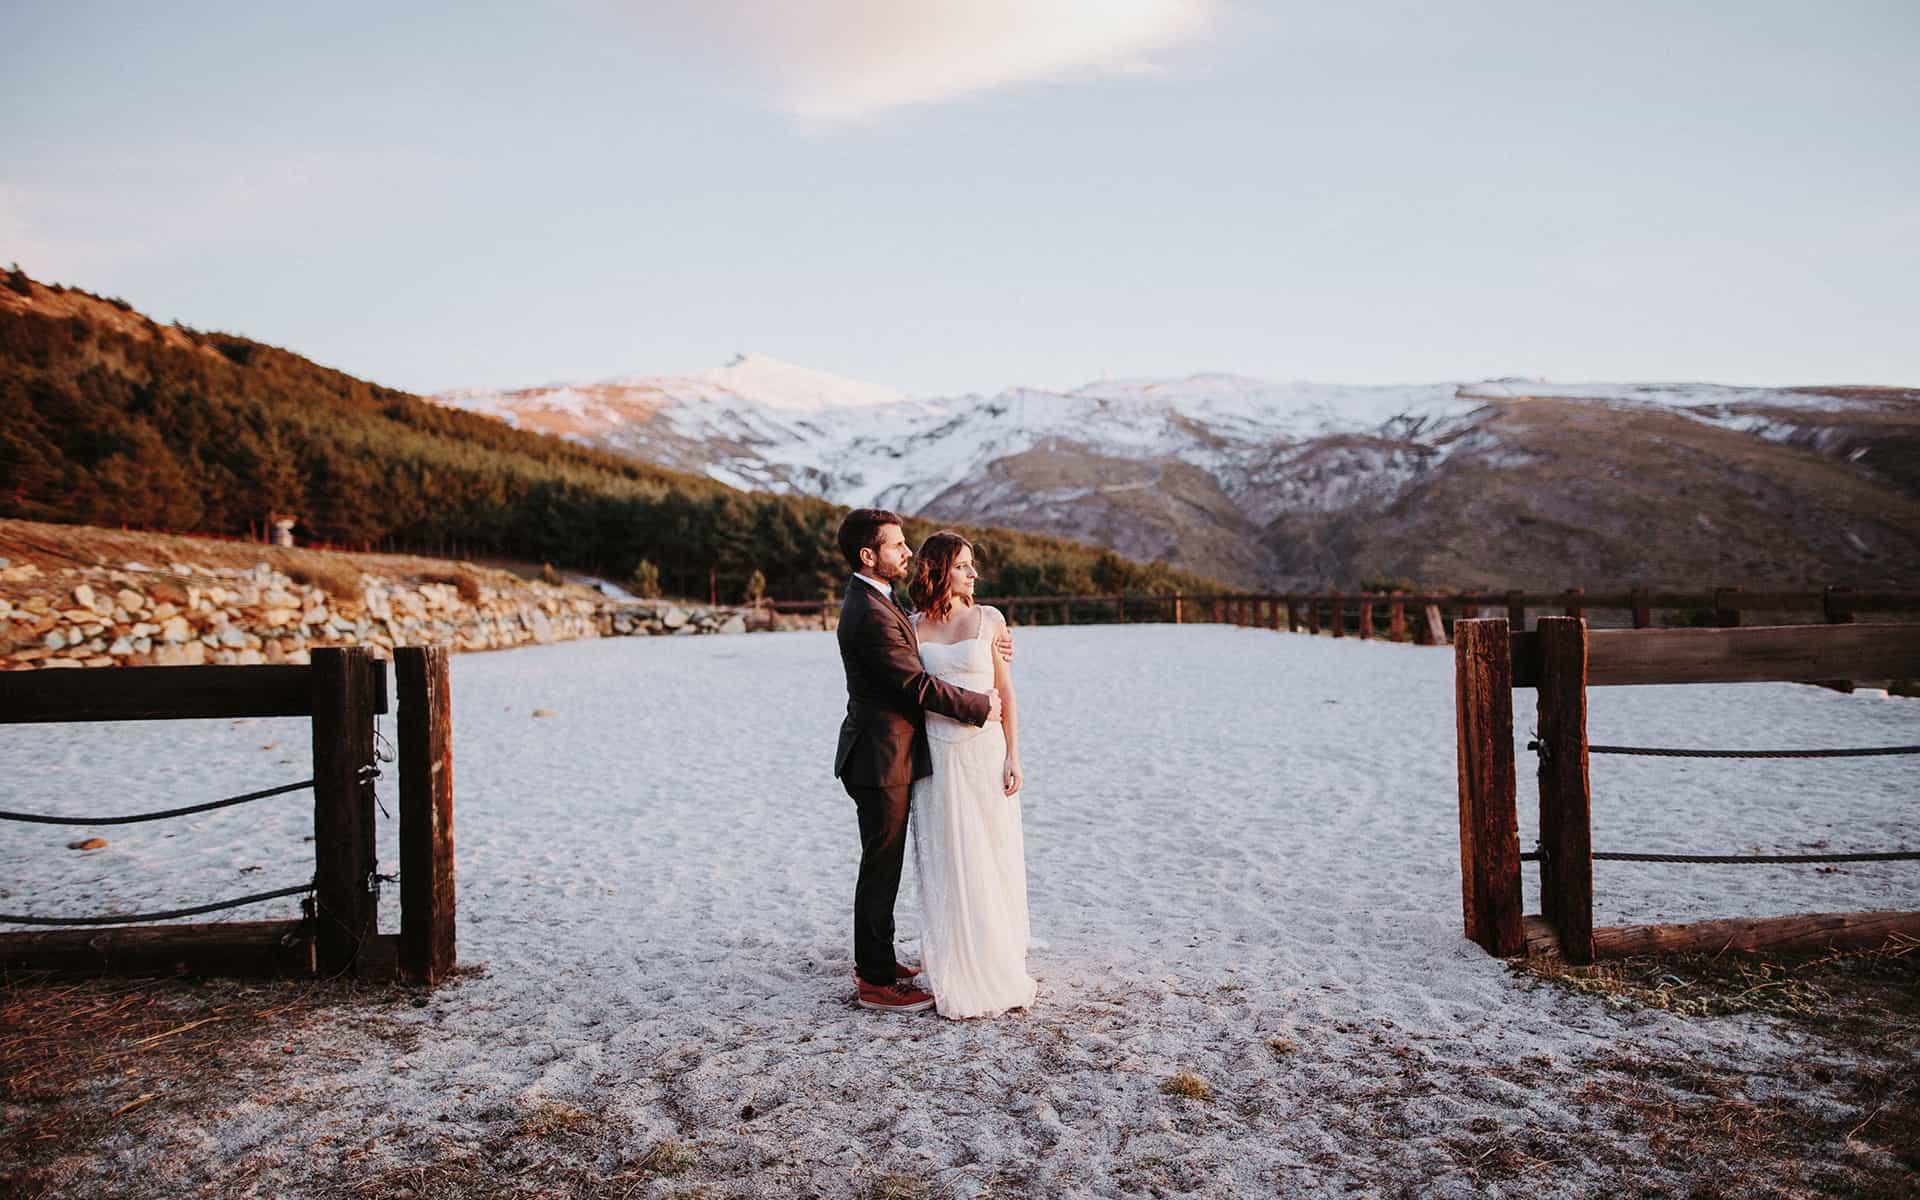 curso-fotografia-experto-bodas-apertura-luis-tenza